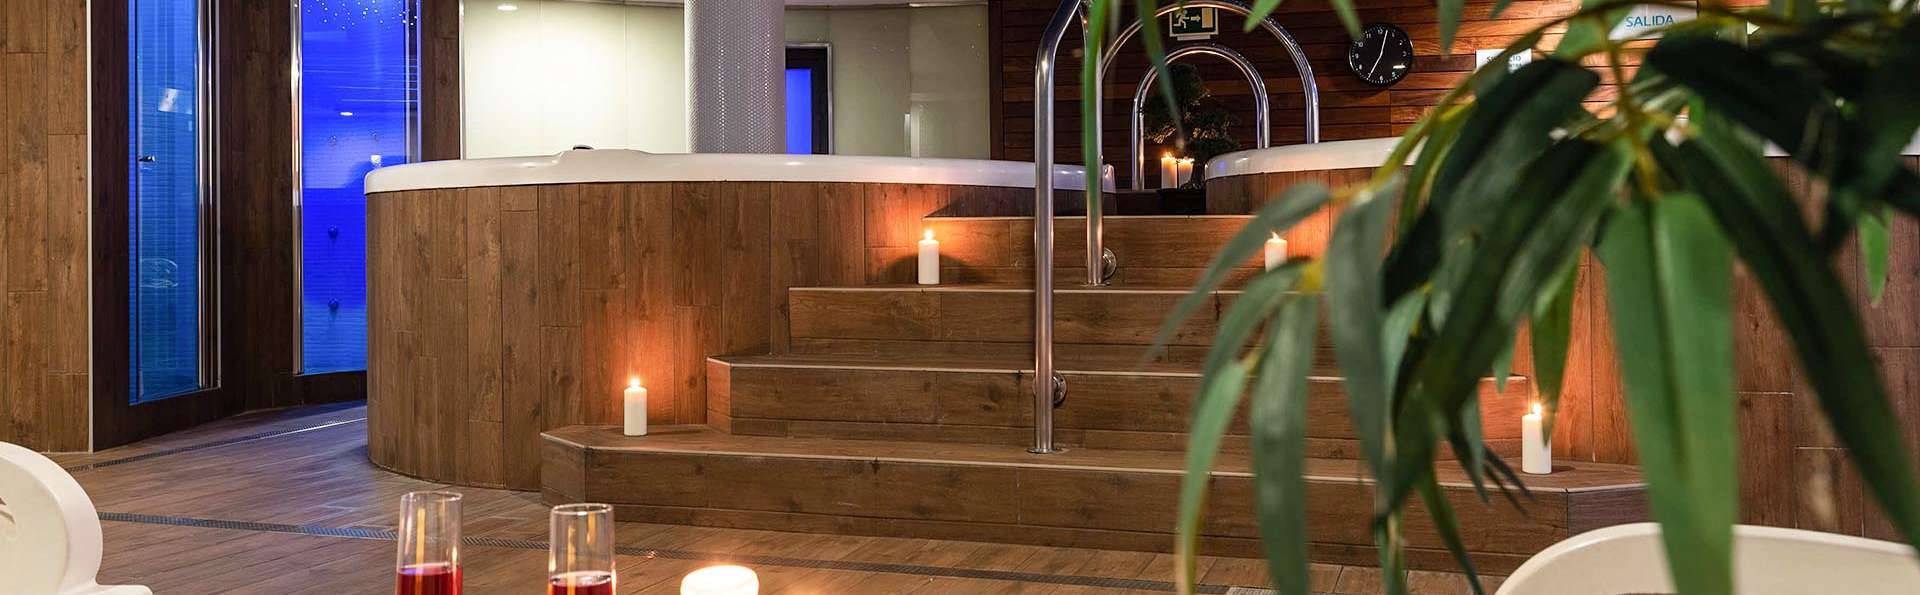 Hotel & Spa Real Ciudad De Zaragoza  - EDIT_HRCZ_PERFIL_SPA_01.jpg